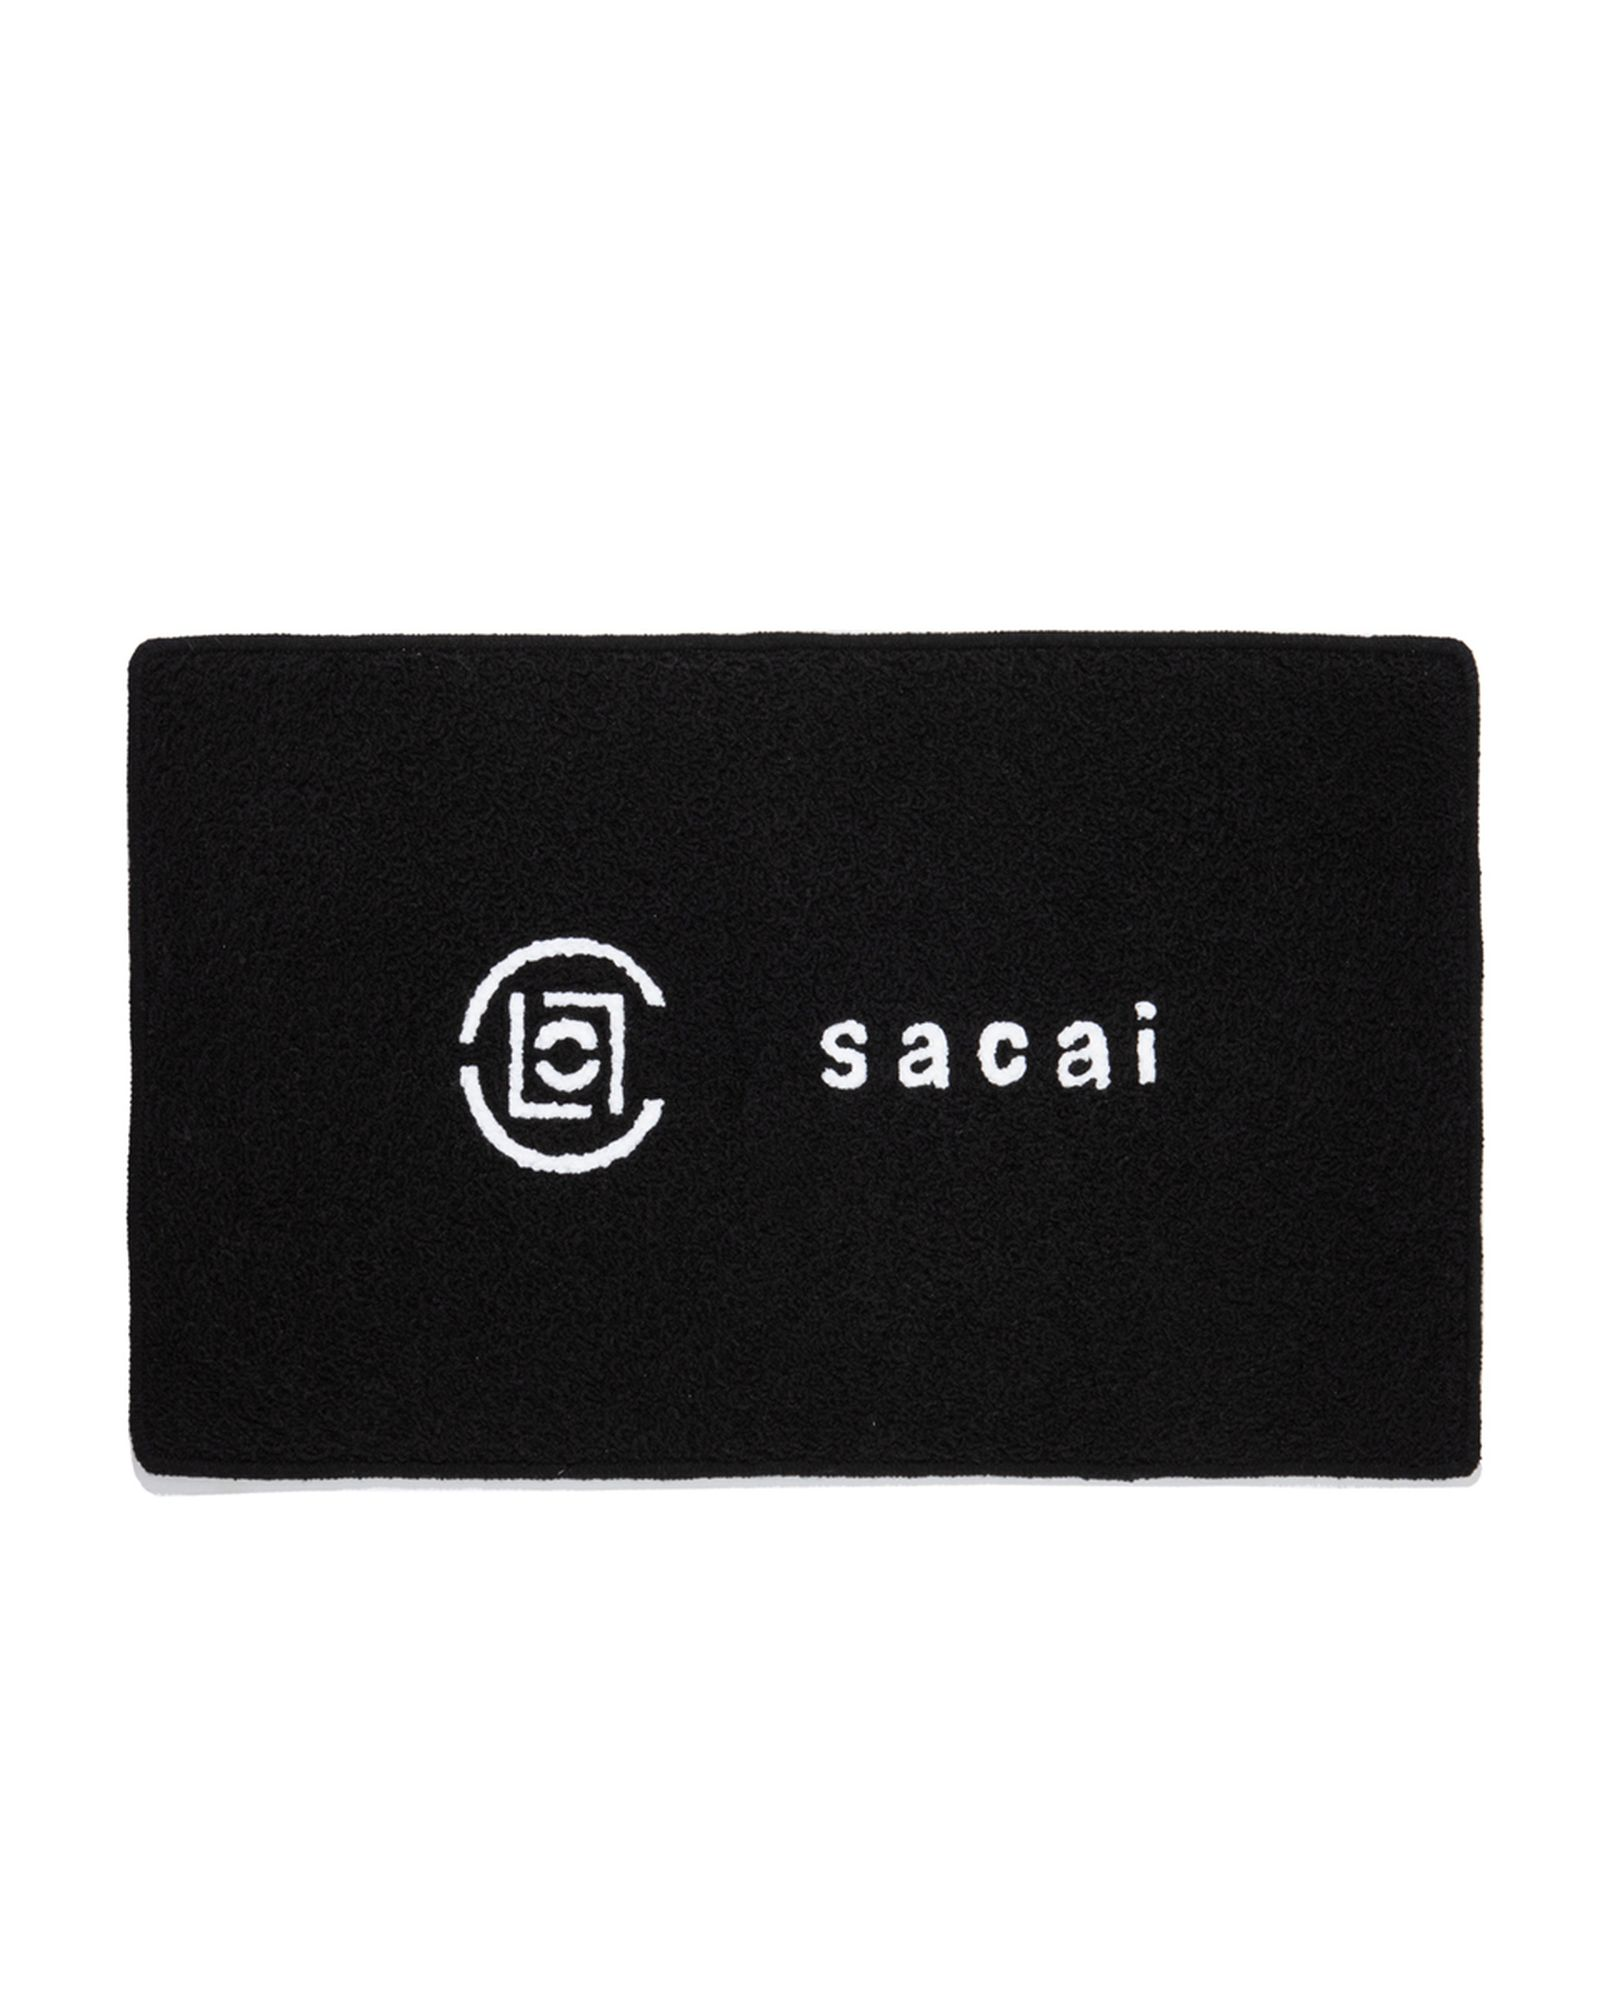 sacai-clot-nike-the-home-pop-up (46)